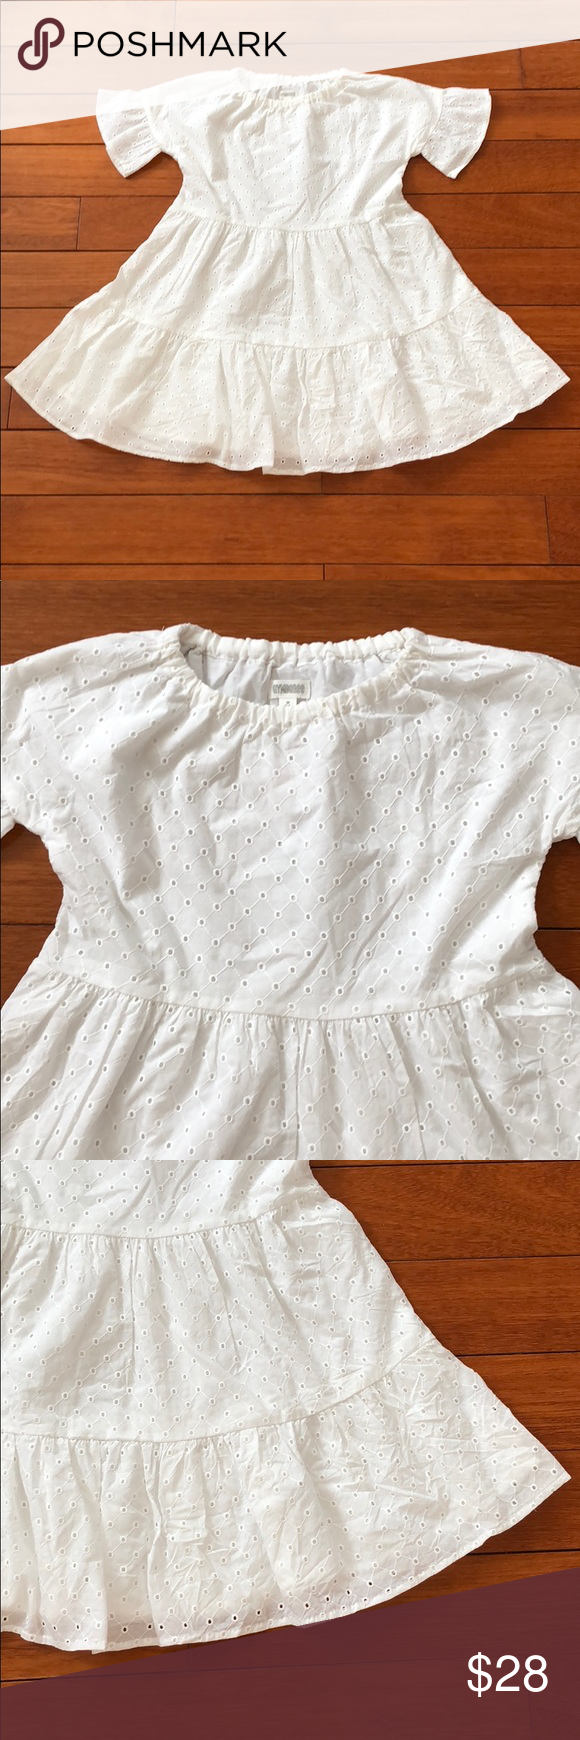 Hp Nwt Gymboree Girls White Eyelet Dress M7 8 Fashion White Eyelet Dress Combo Dress [ 1740 x 580 Pixel ]